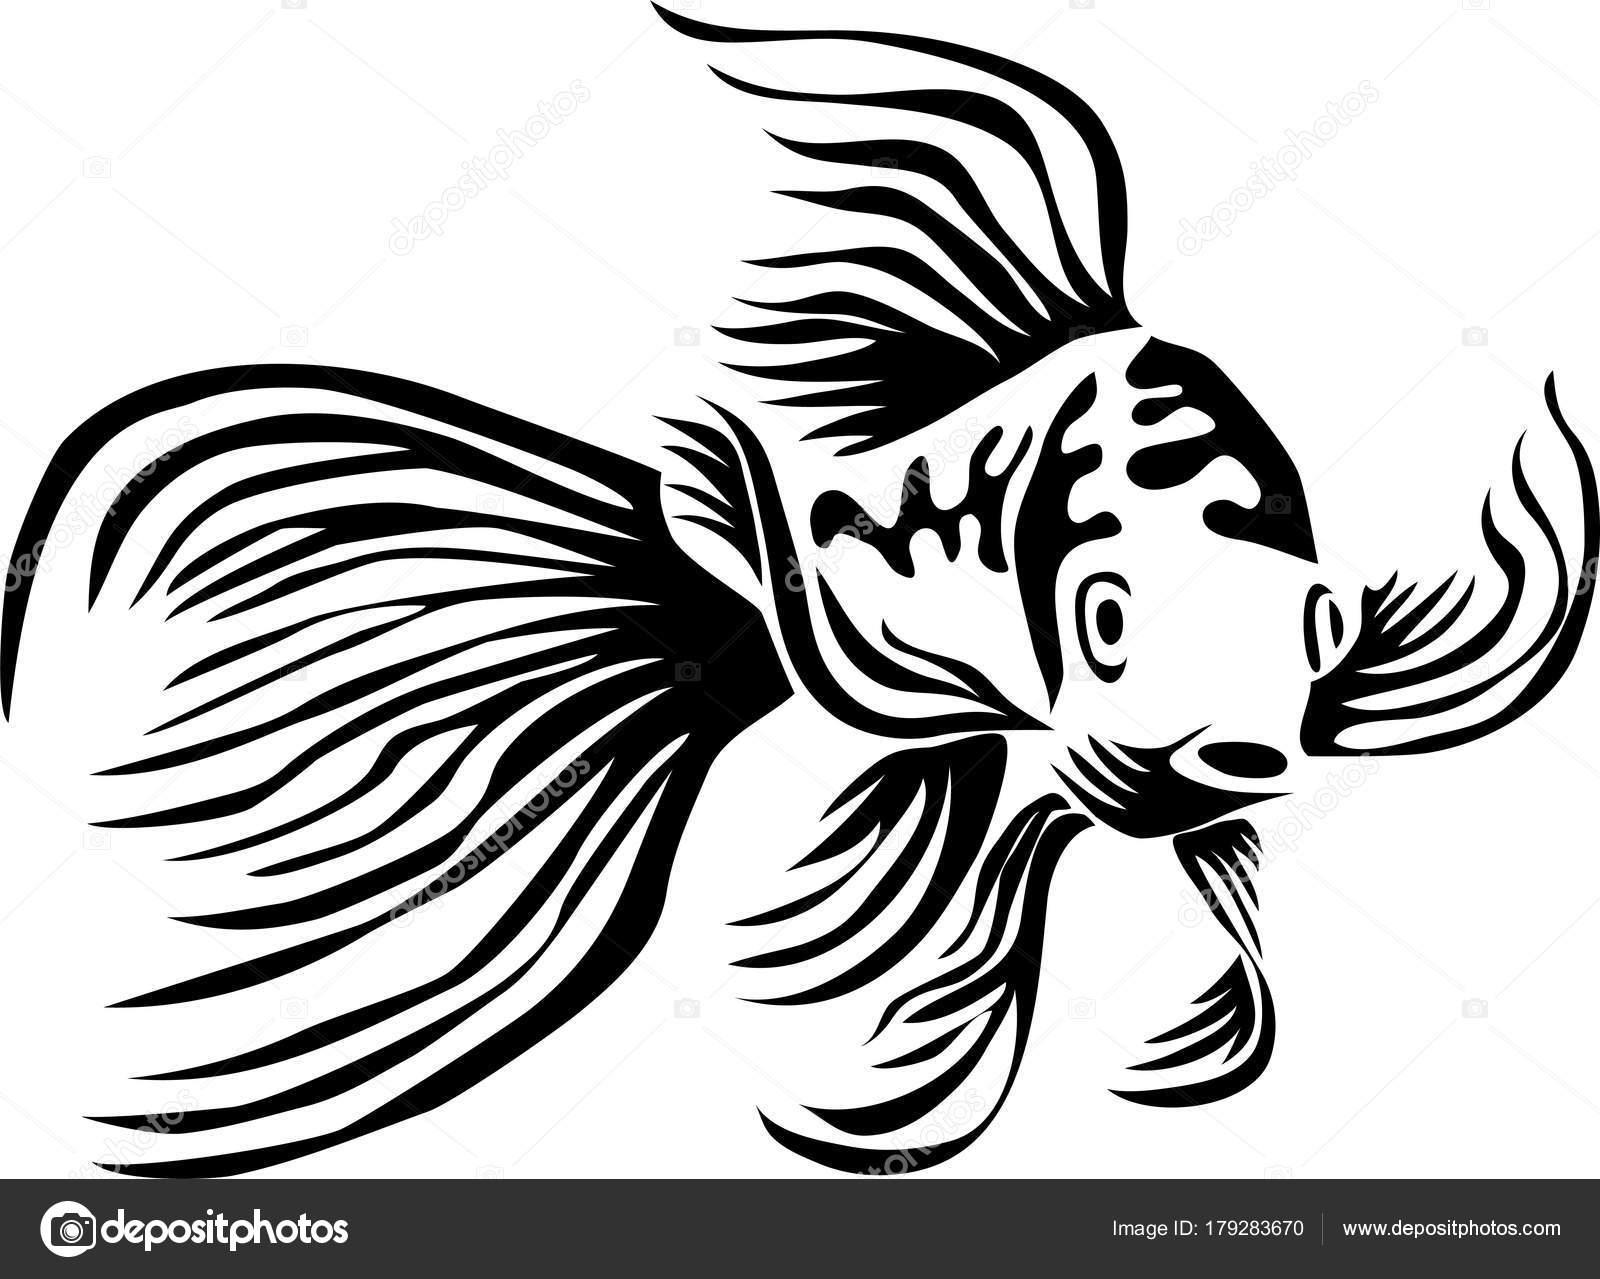 Butterfly Carp Butterfly Koi Fish Stylized Black White Vector Illustration Stock Vector C Bokononist 179283670